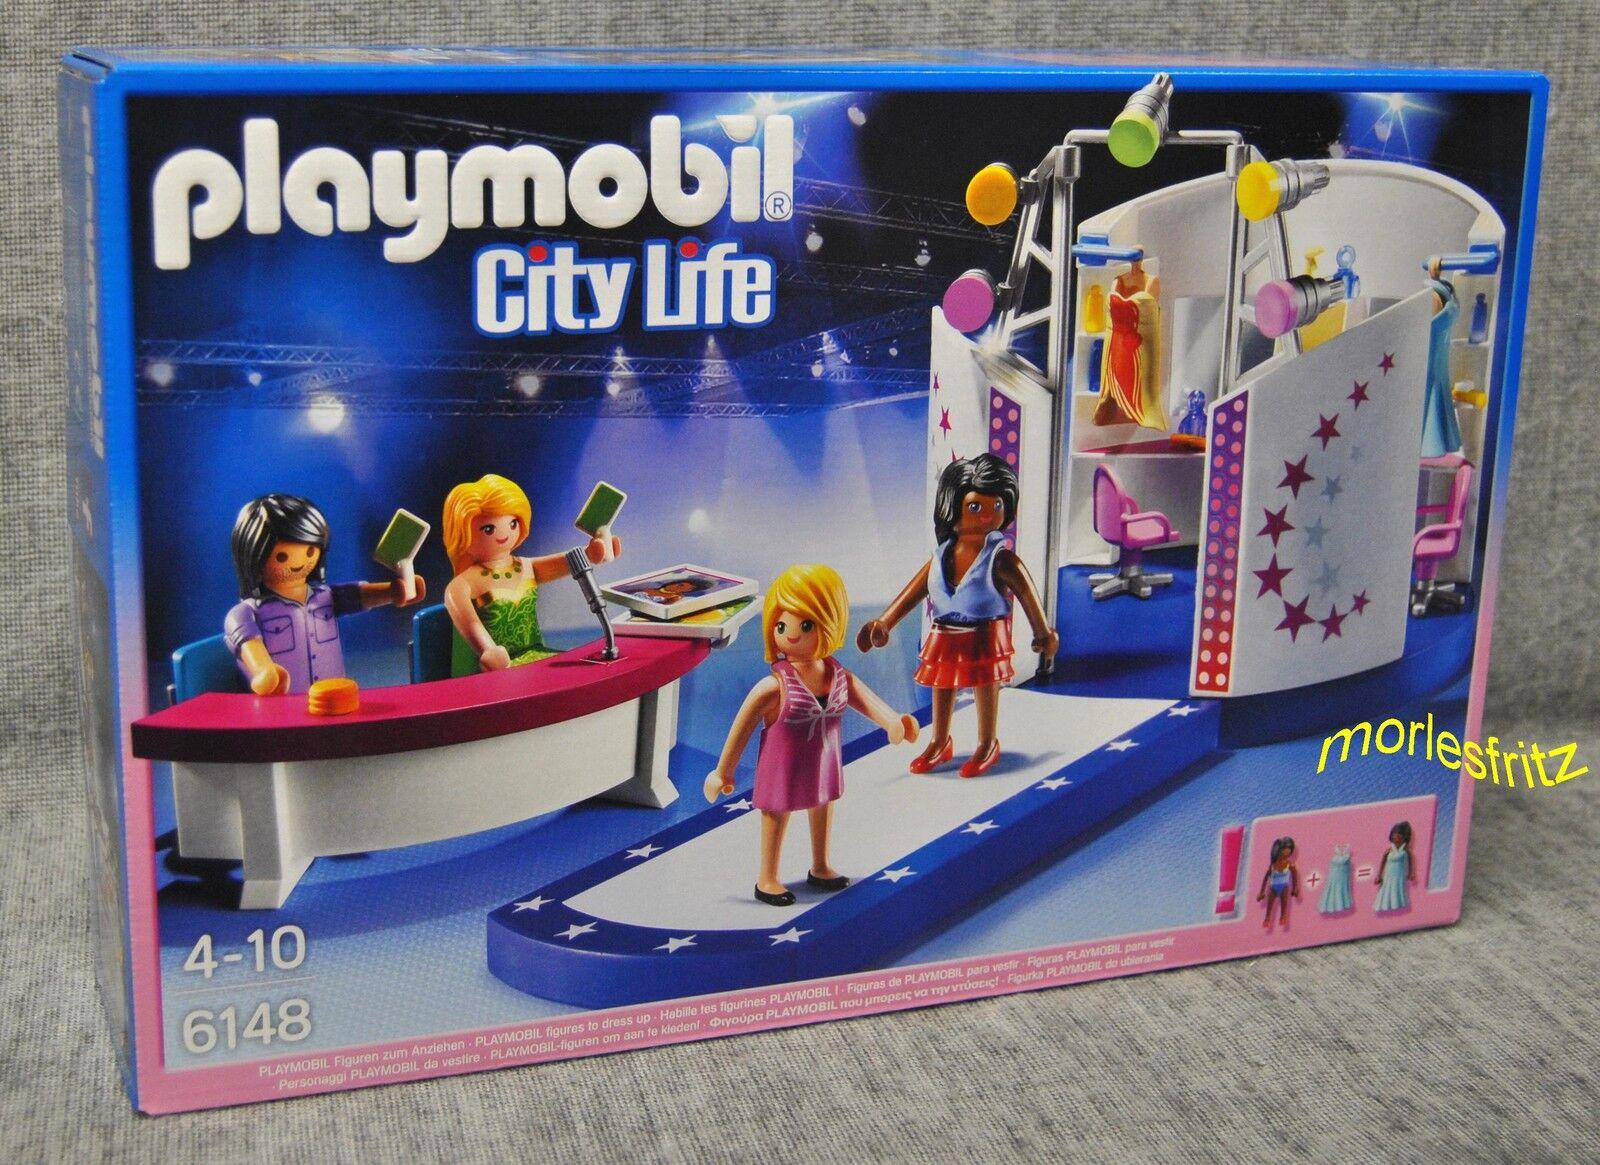 Playmobil 6148 Model-Casting auf dem Laufsteg – Castingshow - City Life - Neu